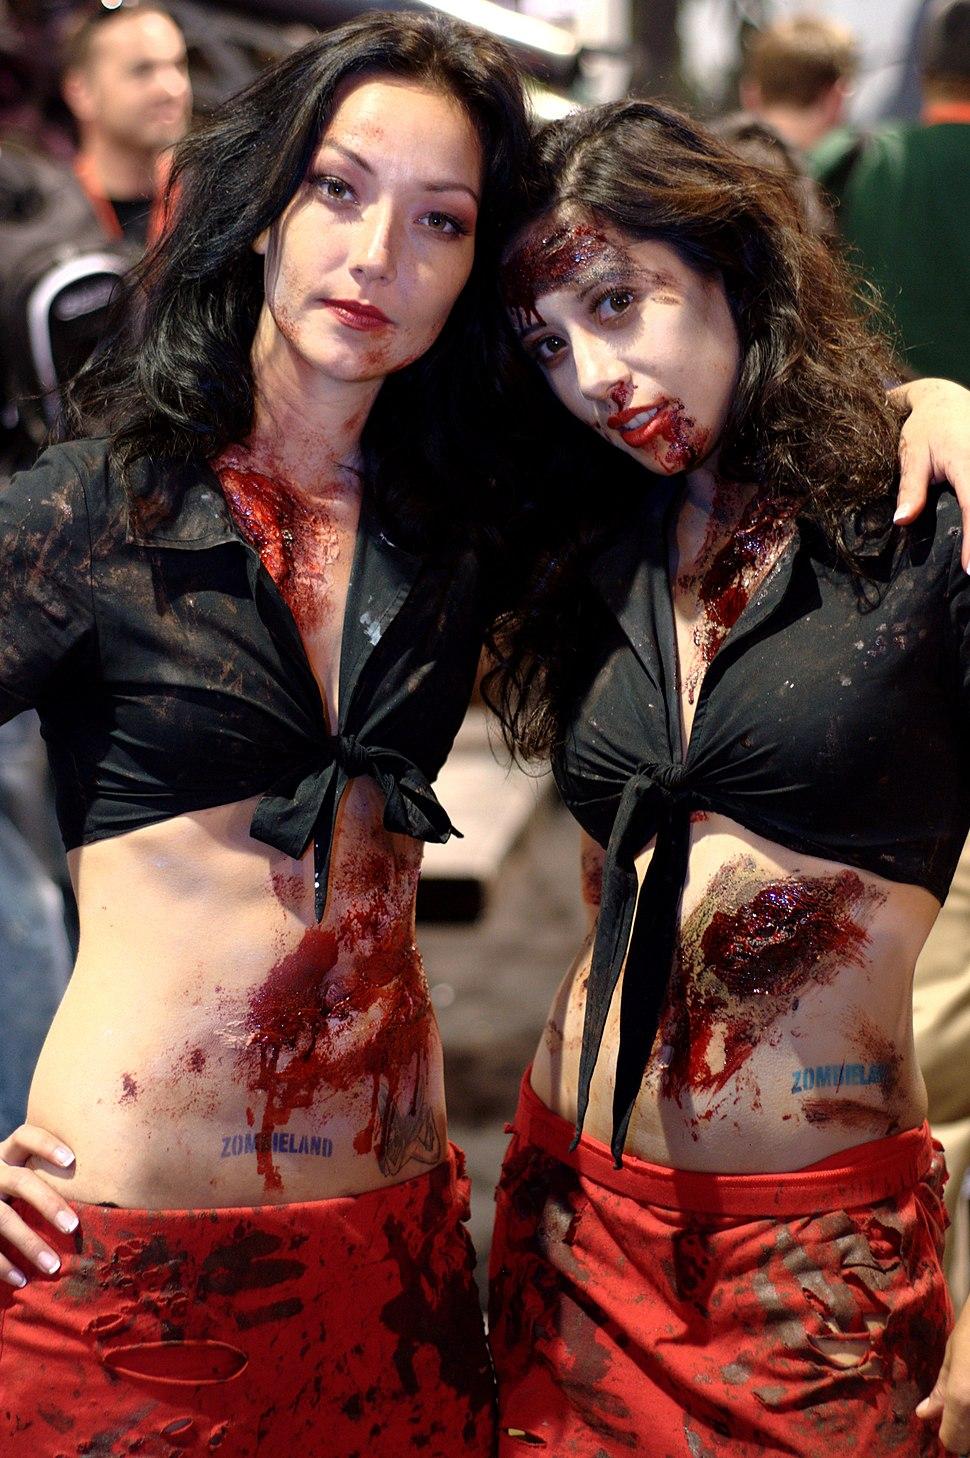 Zombieland models at Comic-con